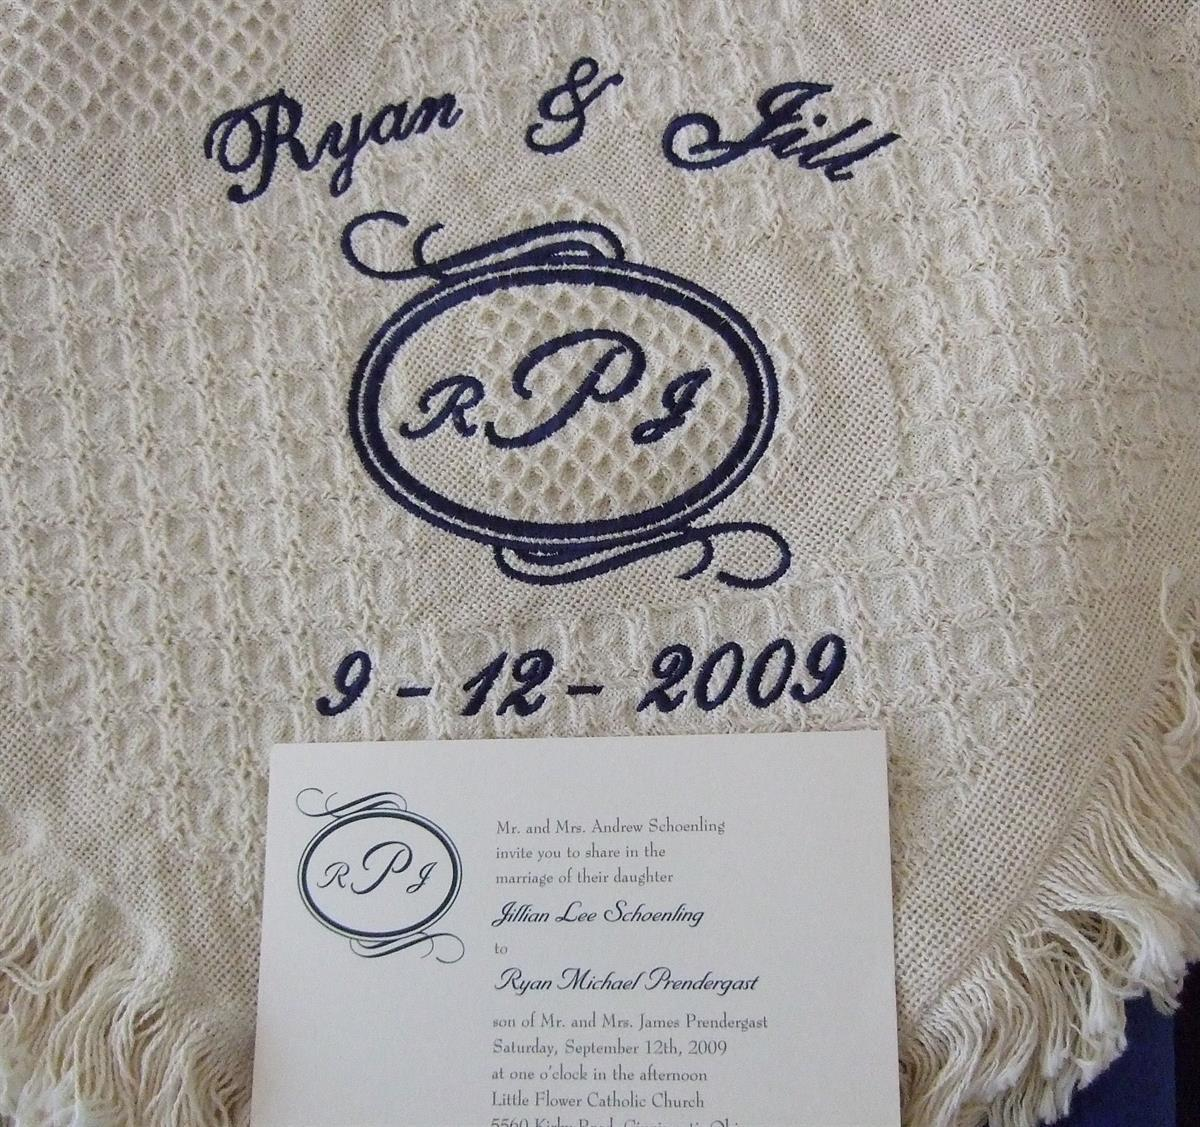 Monogram from wedding invitaion on blanket